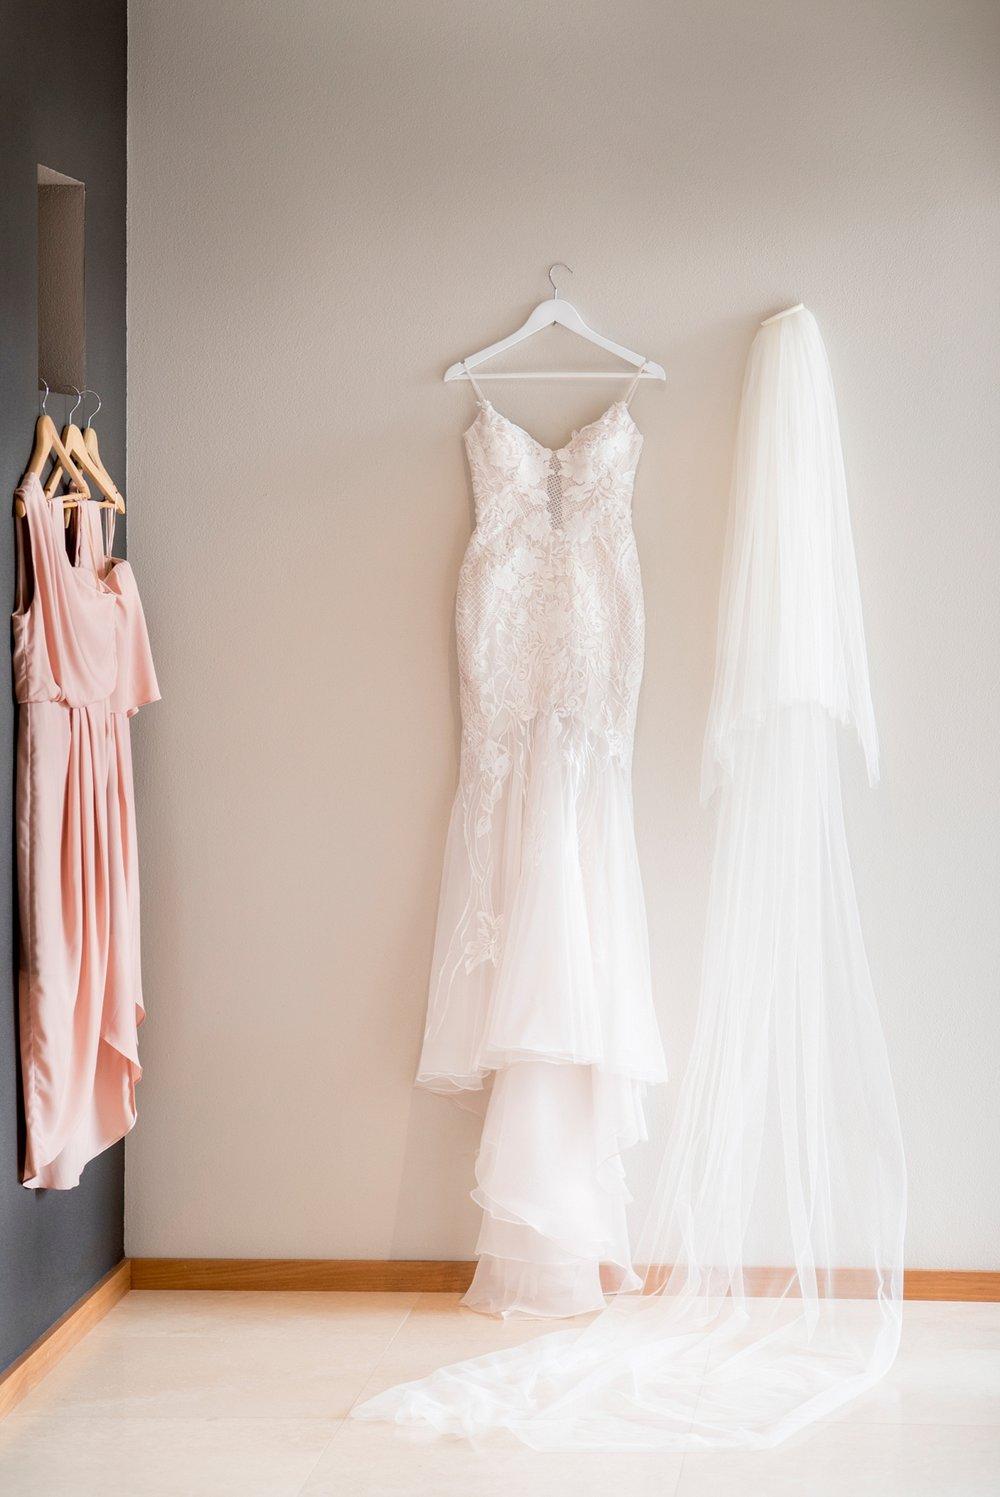 02_zanais couture wedding perth.jpg